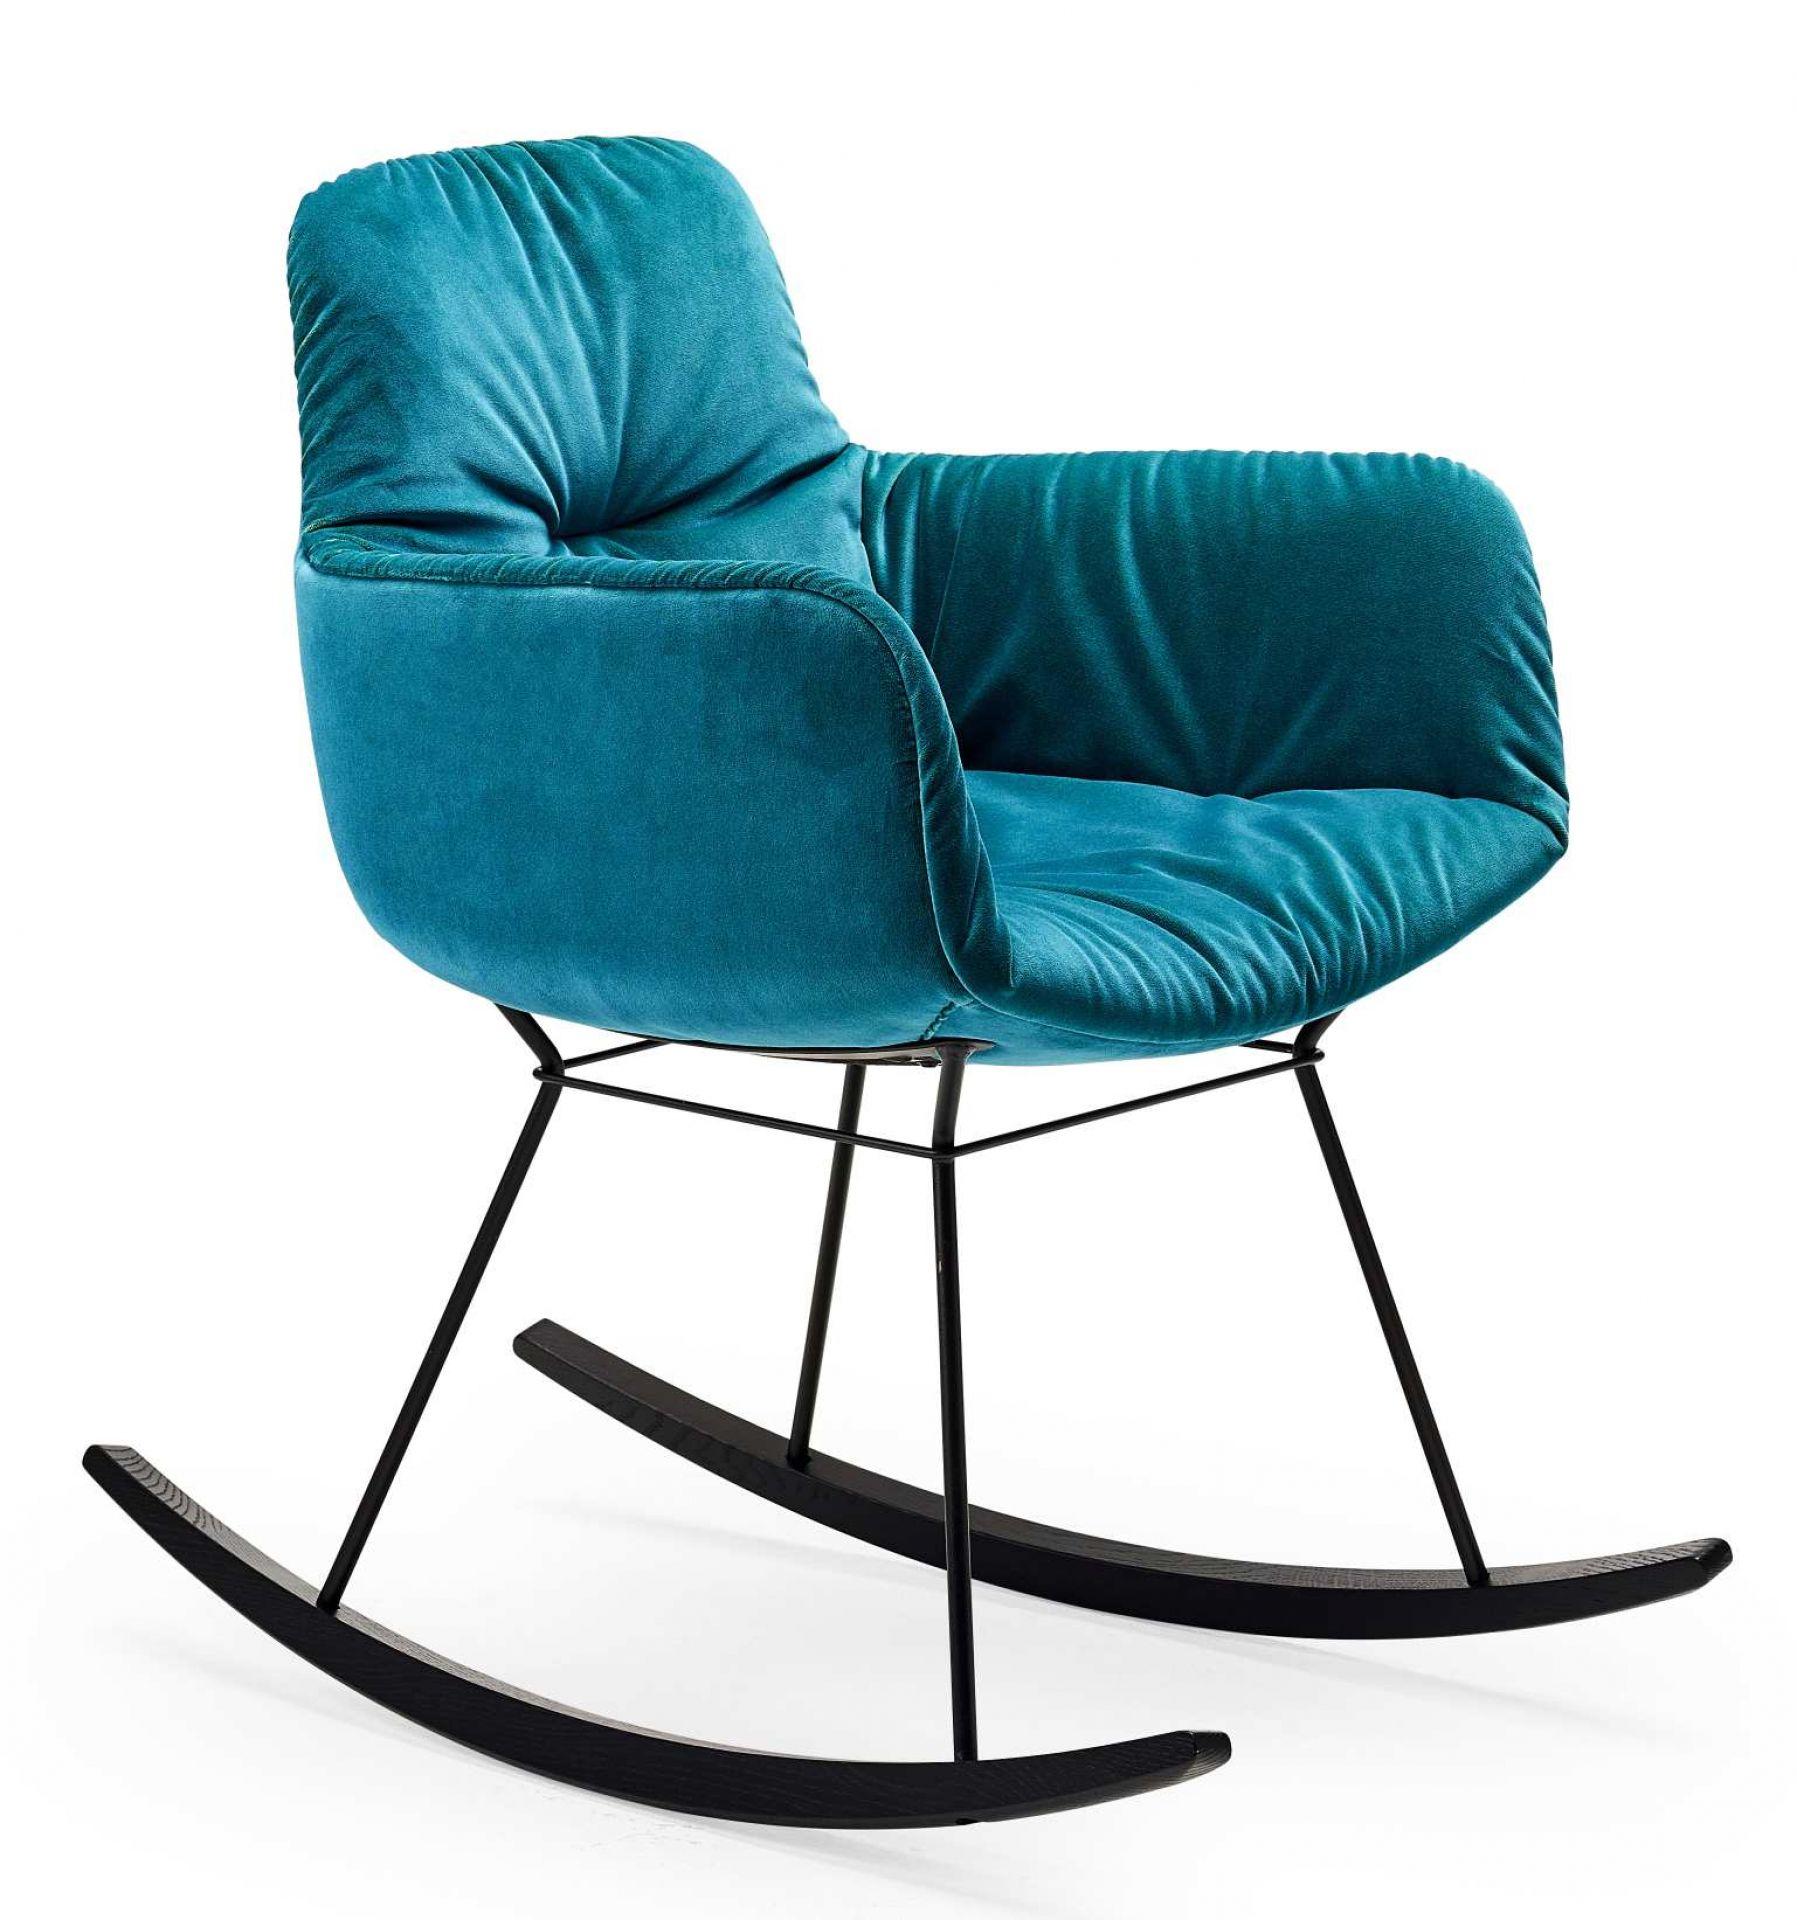 Leya Rocking Lounge Chair Small Schaukelstuhl Freifrau Sitzmöbelmanufaktur